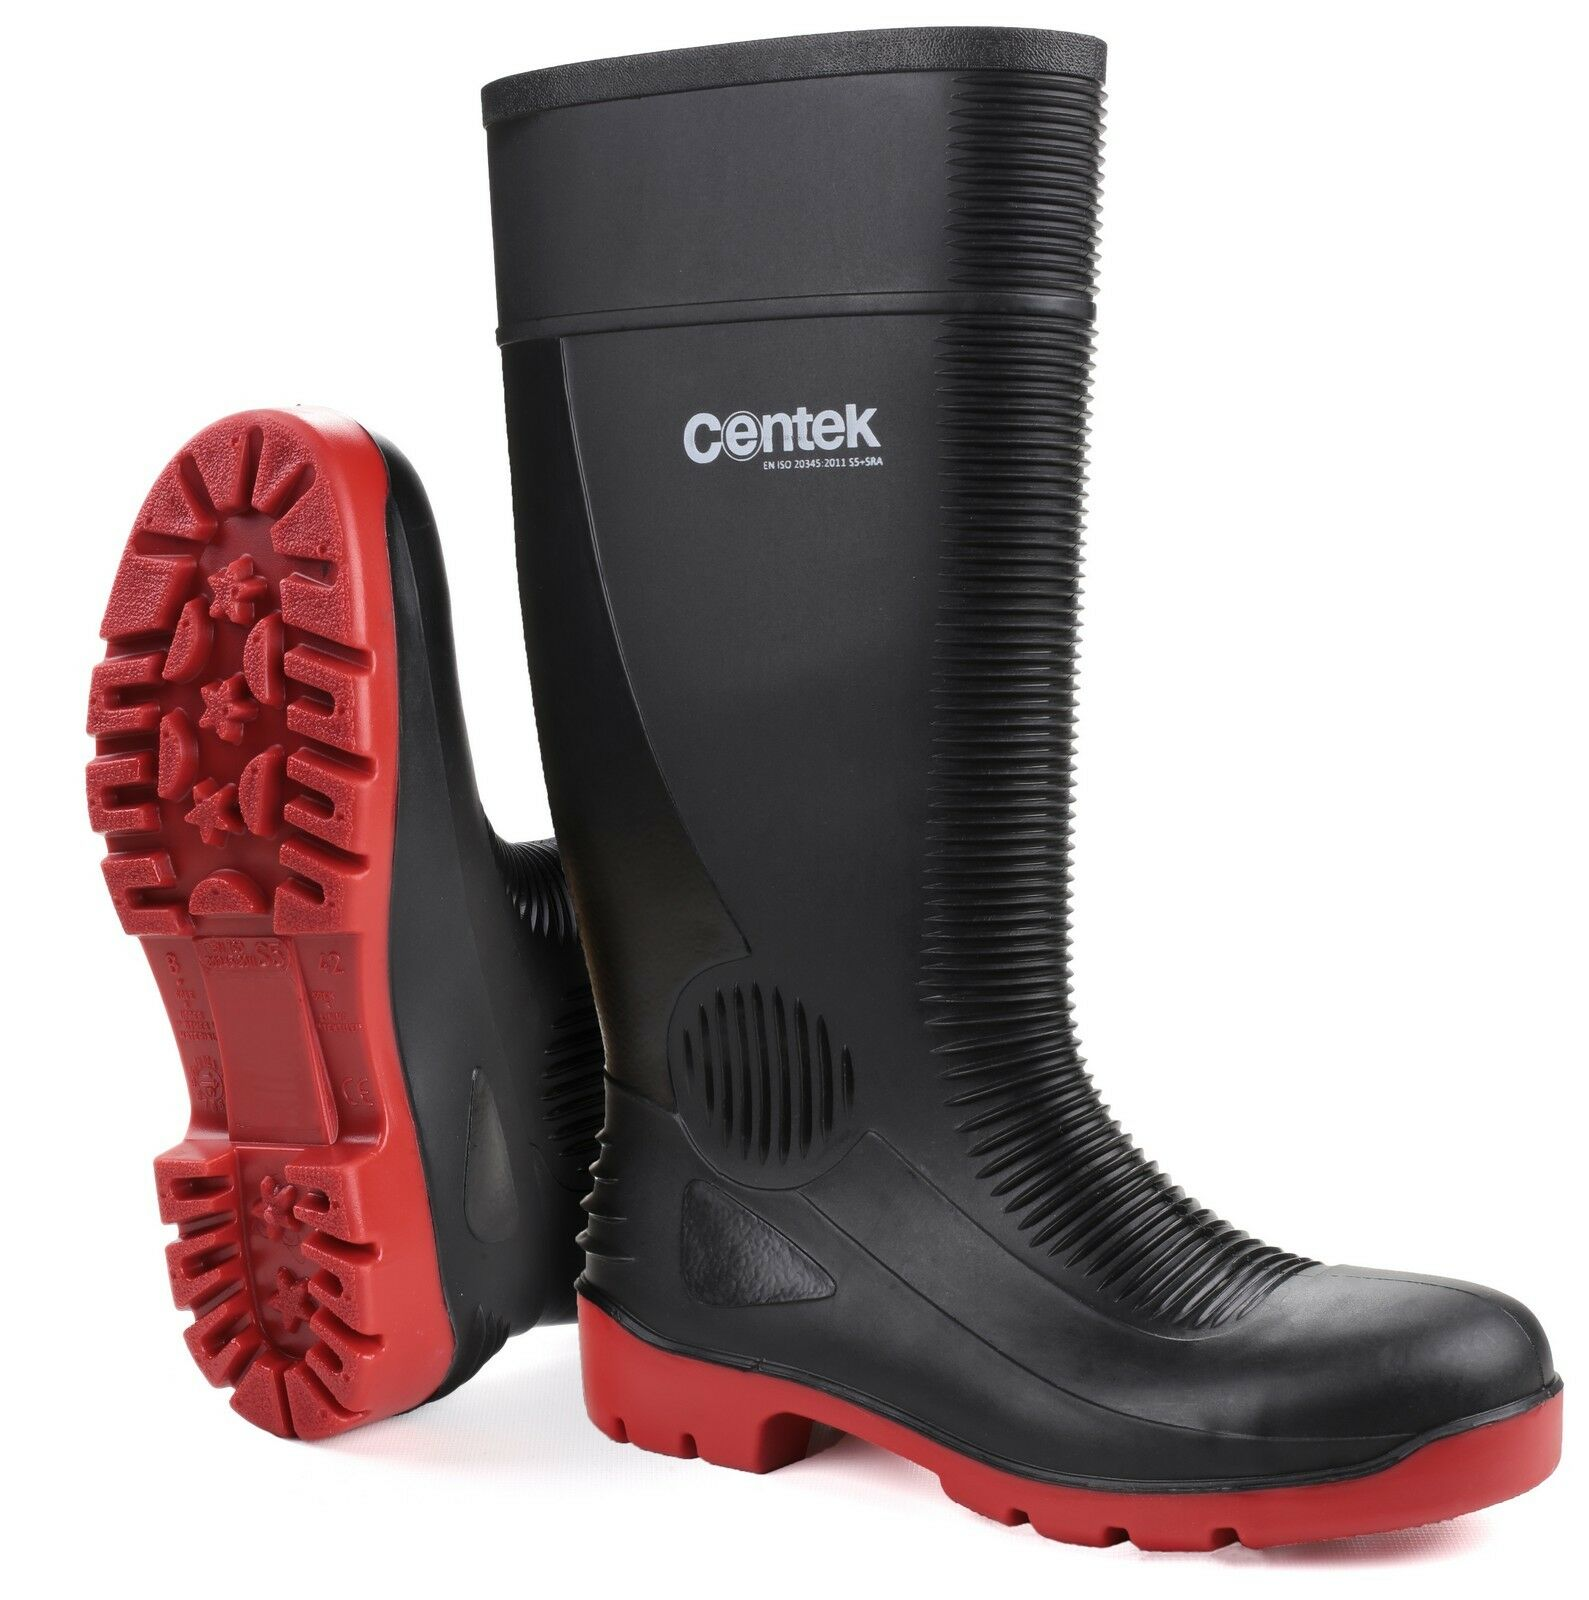 Amblers Safety Men FS100 Safety Wellington Wellies Boot PVC Upper Footwear Black